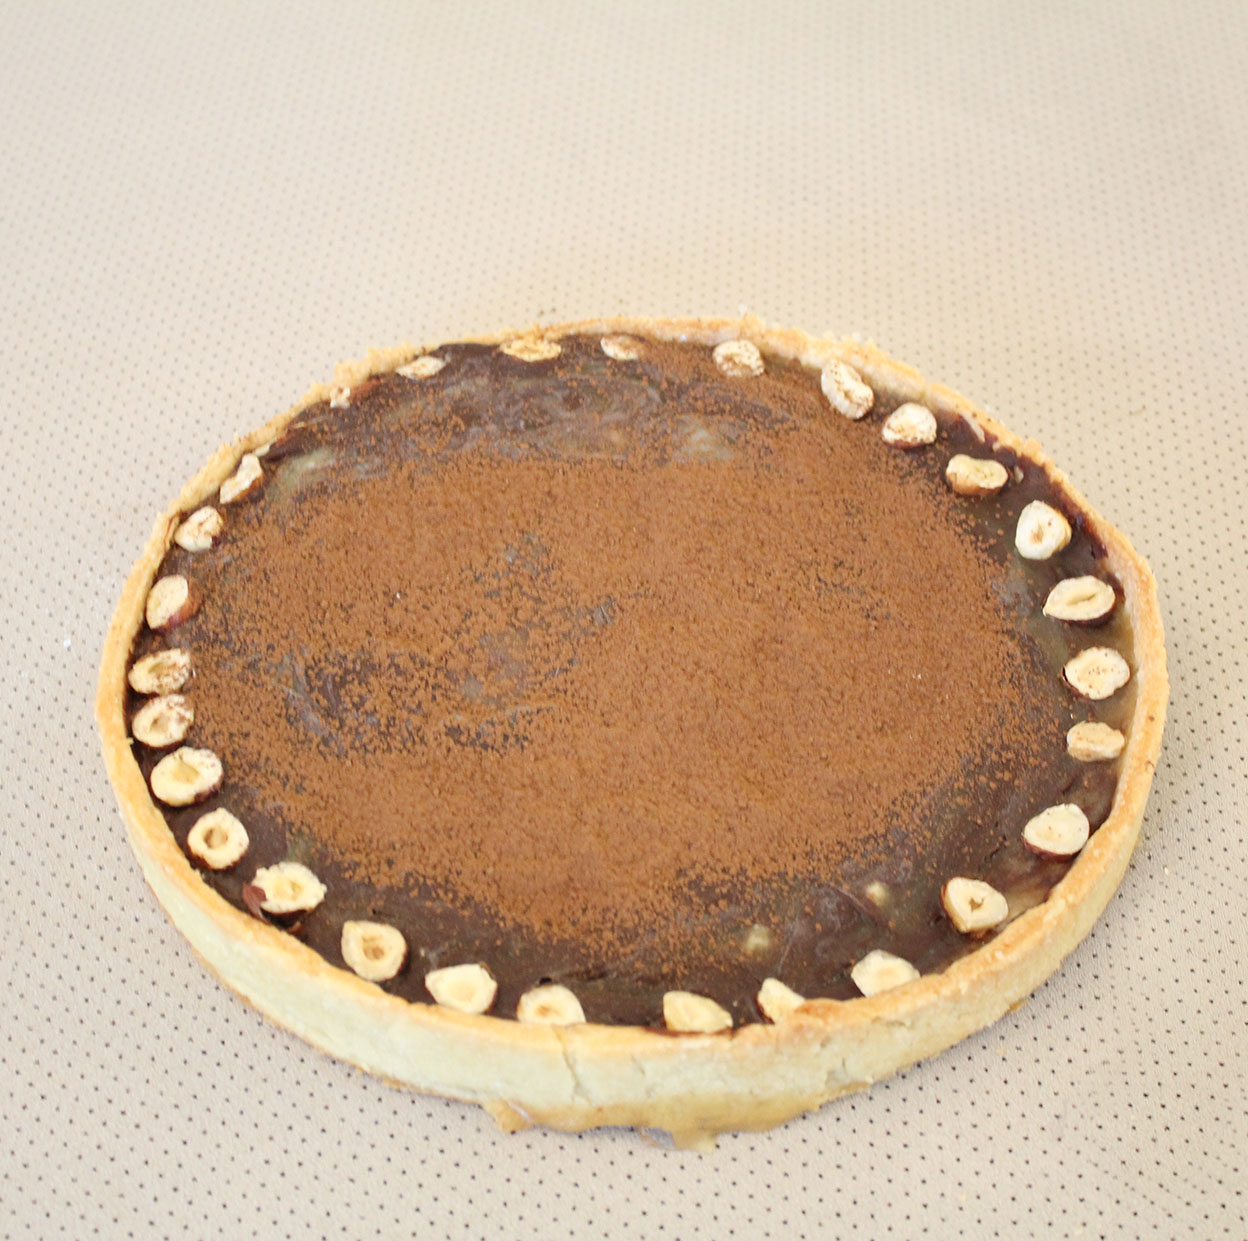 IMG 5055 - טארט שיש קרמל ושוקולד